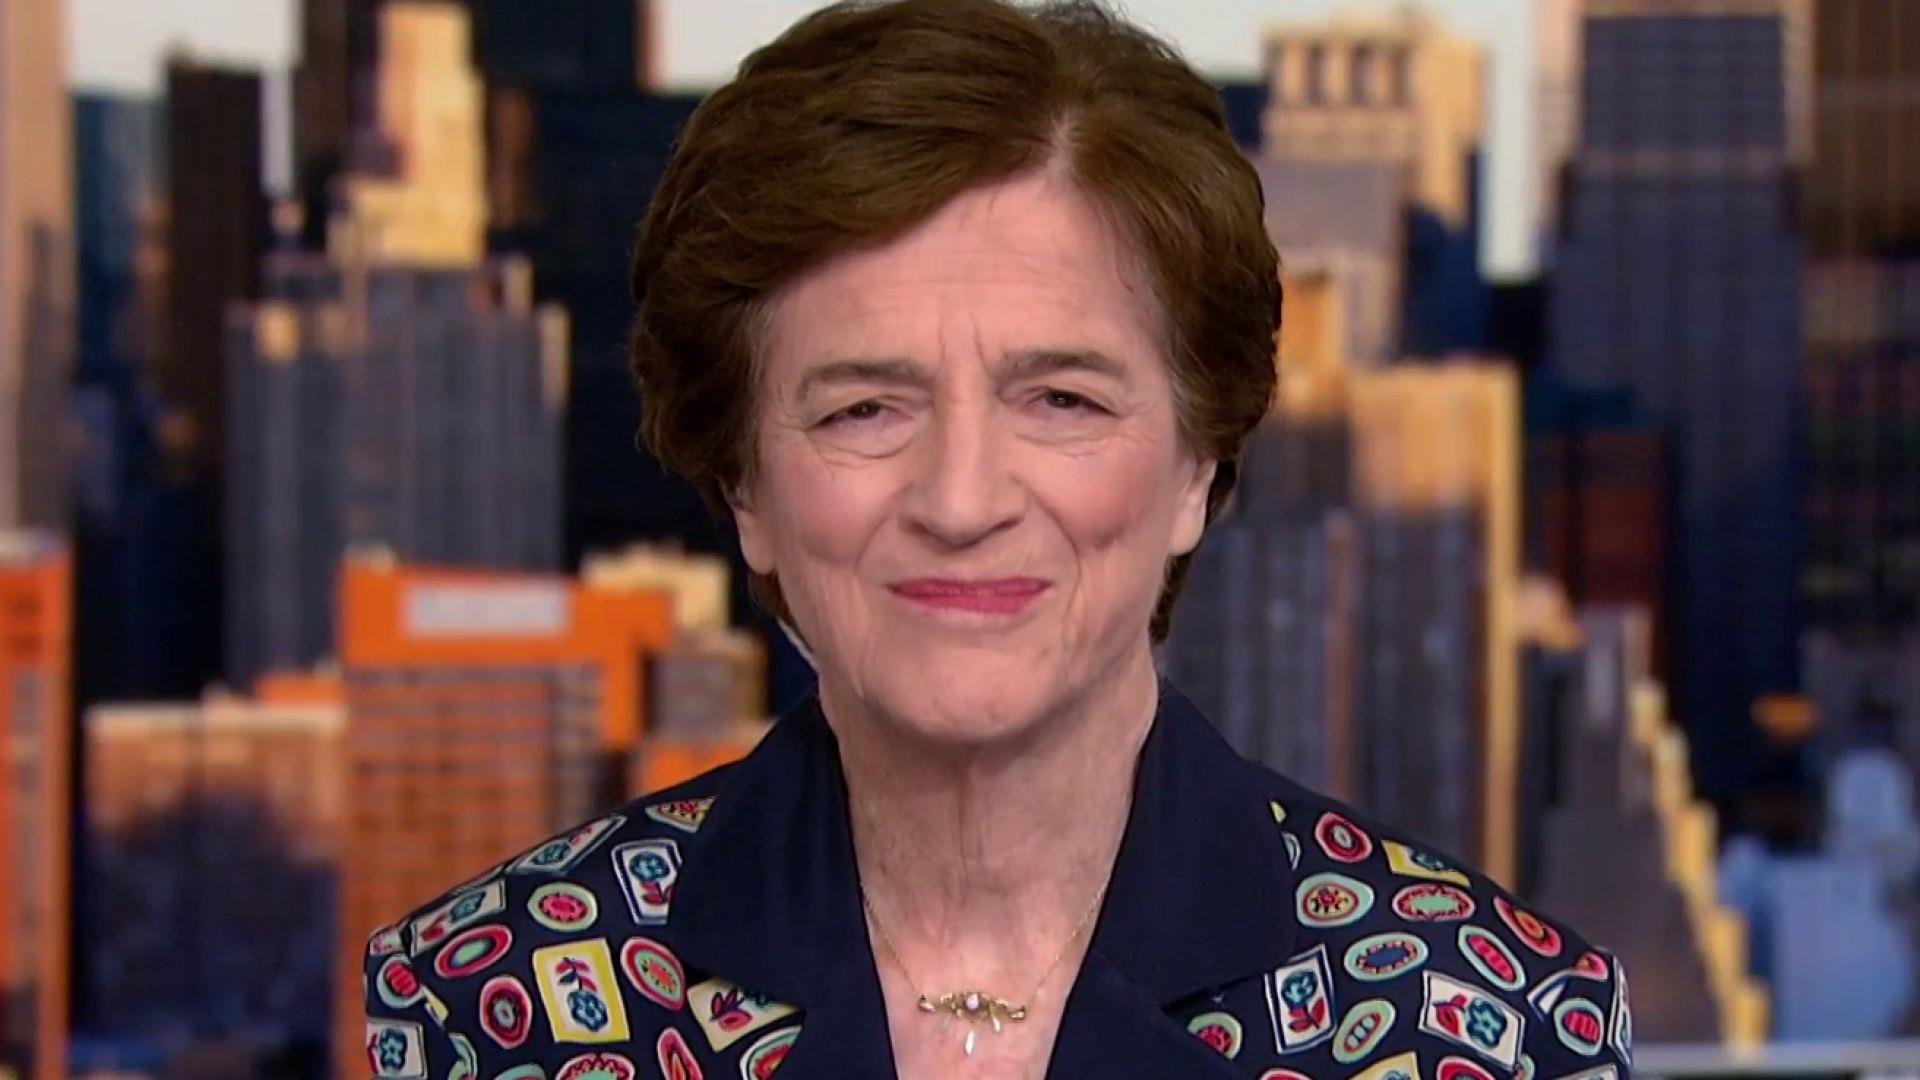 Fmr. Watergate Congresswoman says Trump and Nixon share key similarities